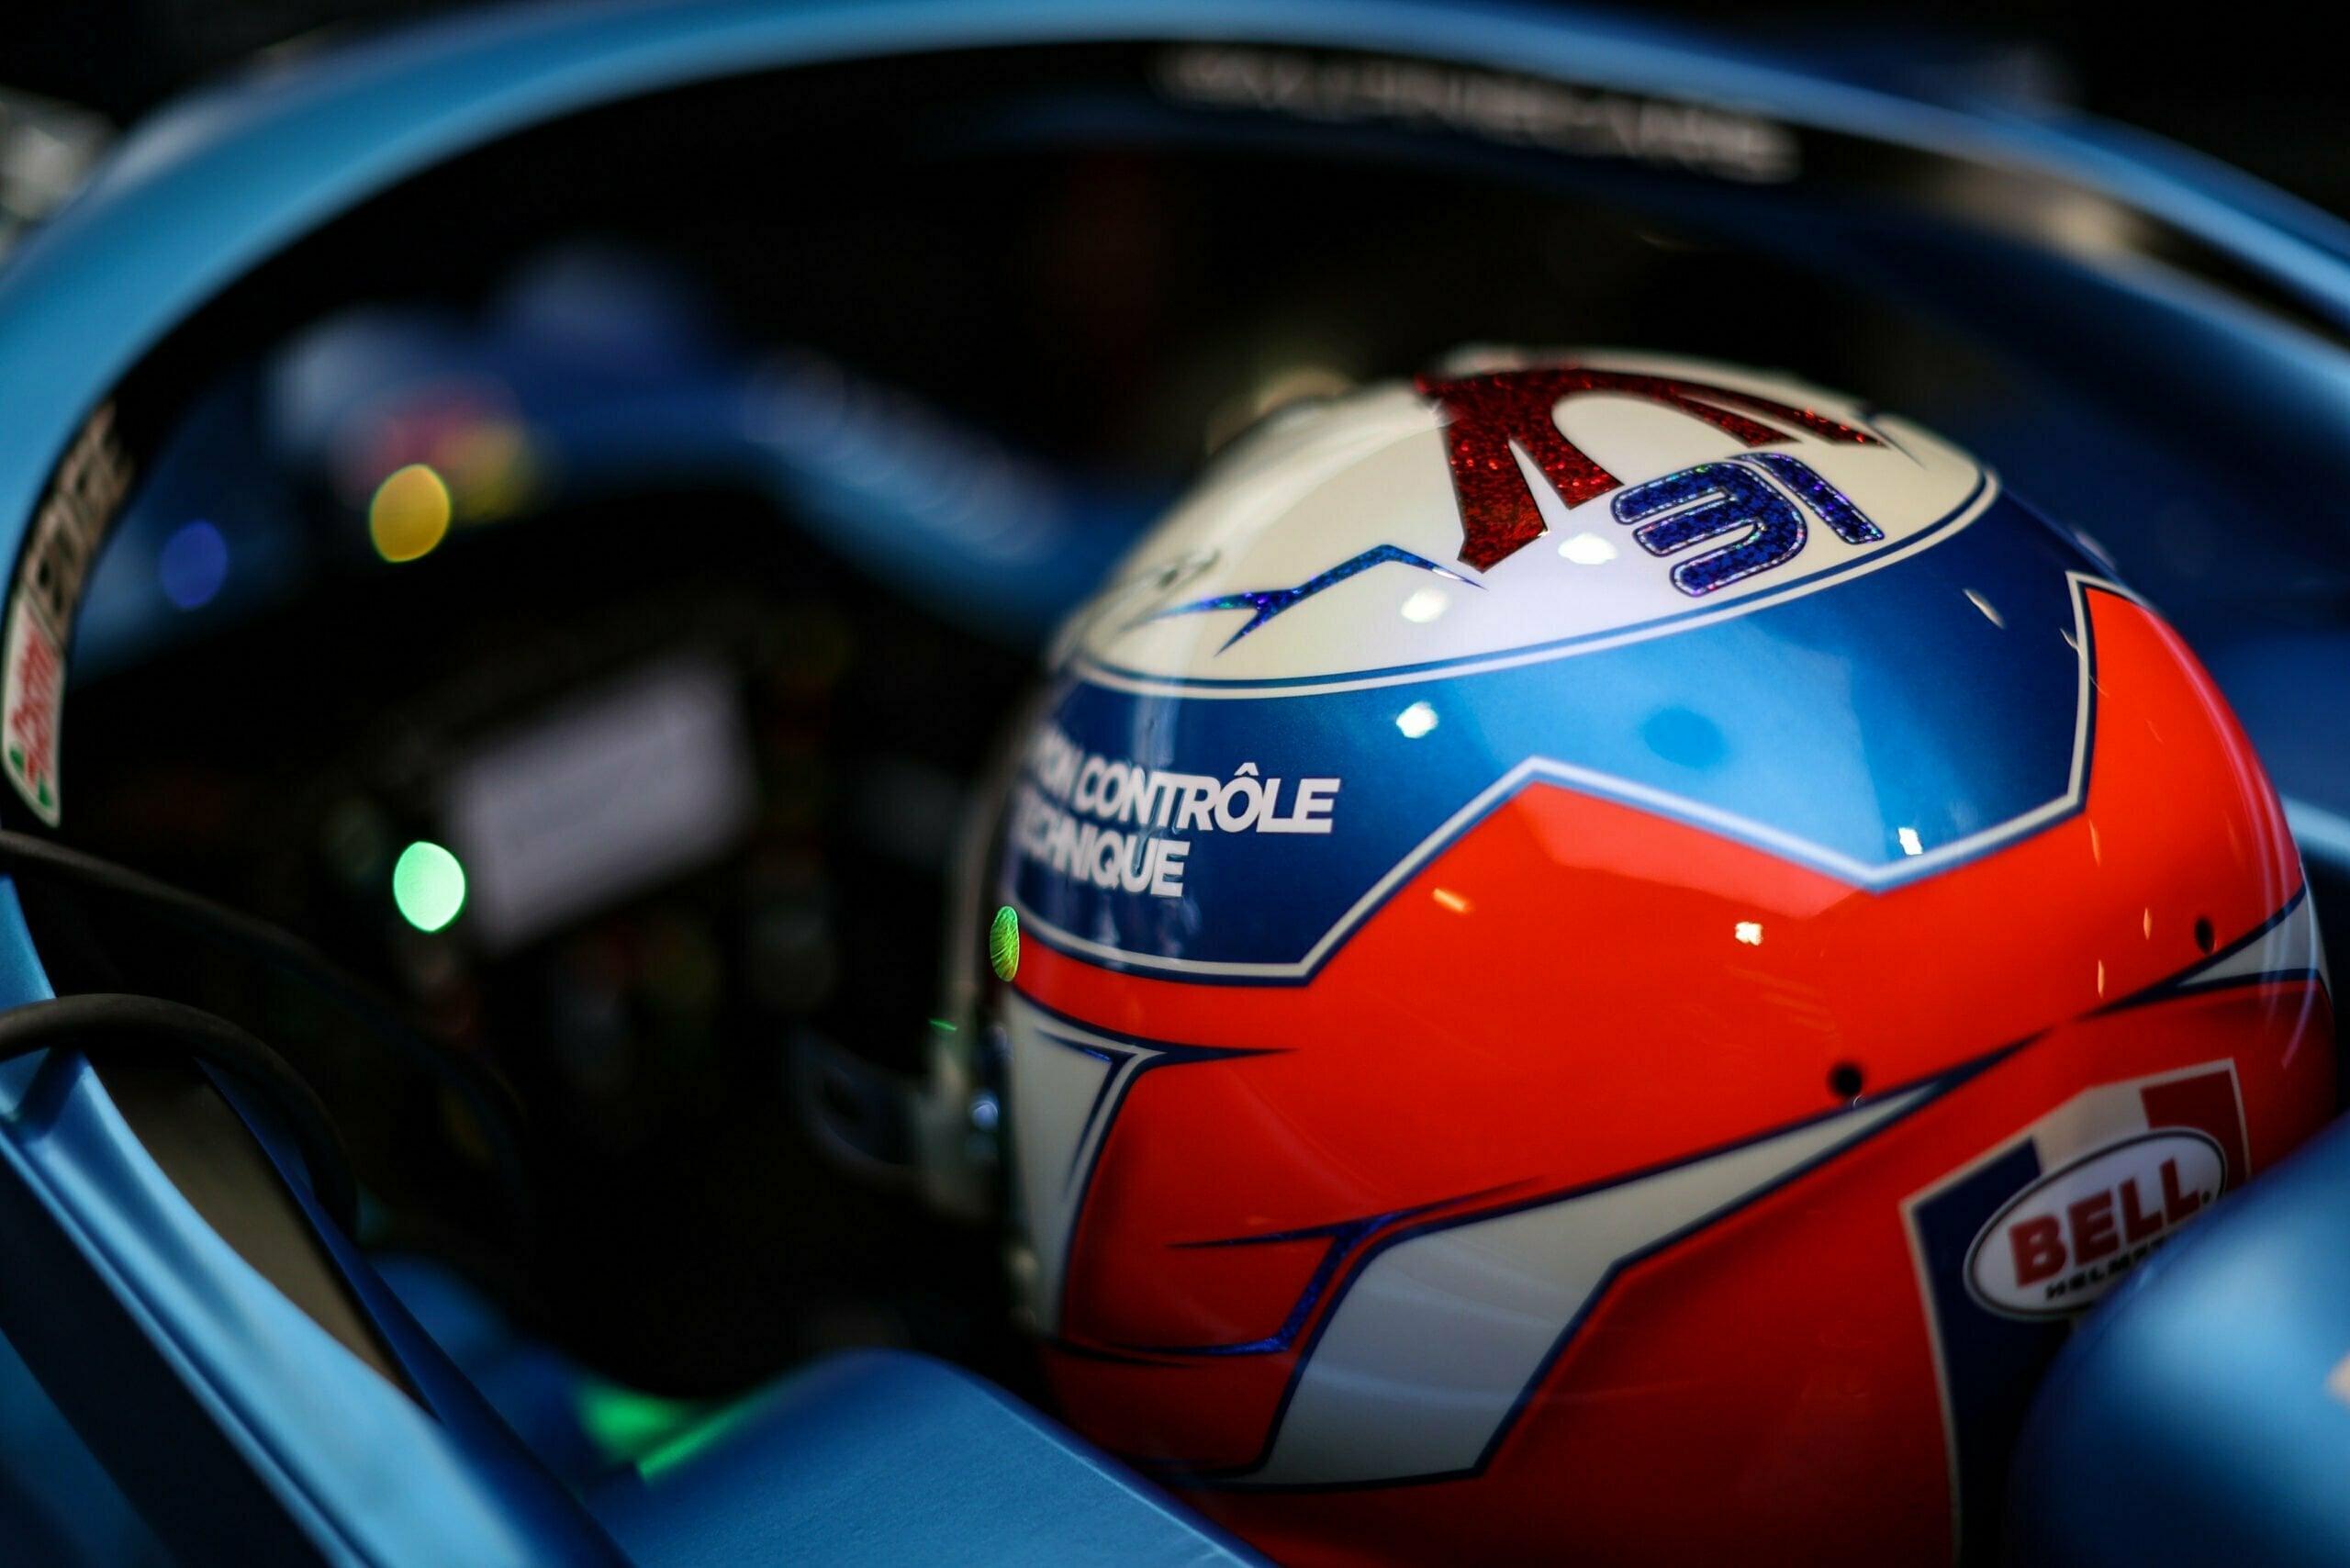 Alpine F1 Team GRAND PRIX HEINEKEN DU PORTUGAL Alonso Ocon 2021 A521 24 scaled   Alpine F1 Team : des essais convaincants au Grand Prix Heineken du Portugal